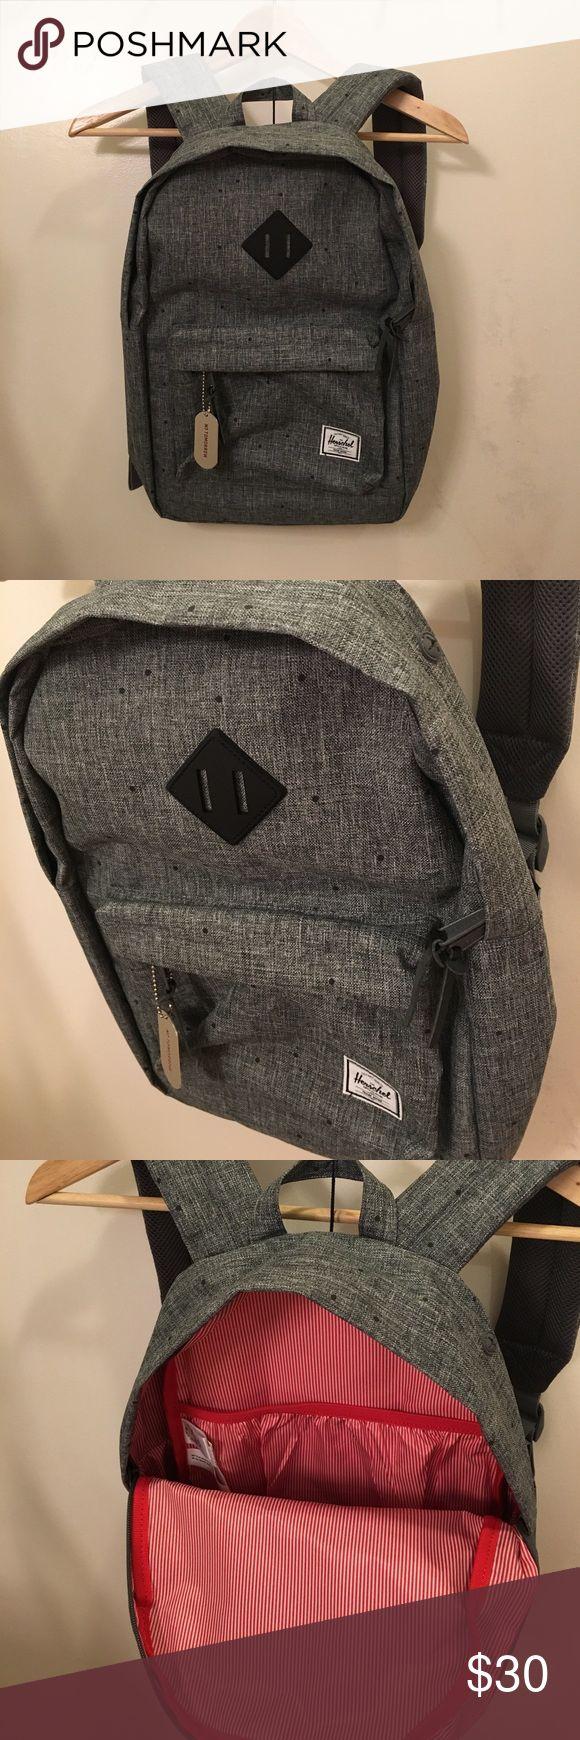 Herschel small grey backpack Brand new grey Herschel Heritage backpack. Original price on Herschel website $60. Approximately 18x12x5 inches - smaller than a normal backpack. Herschel Supply Company Bags Backpacks